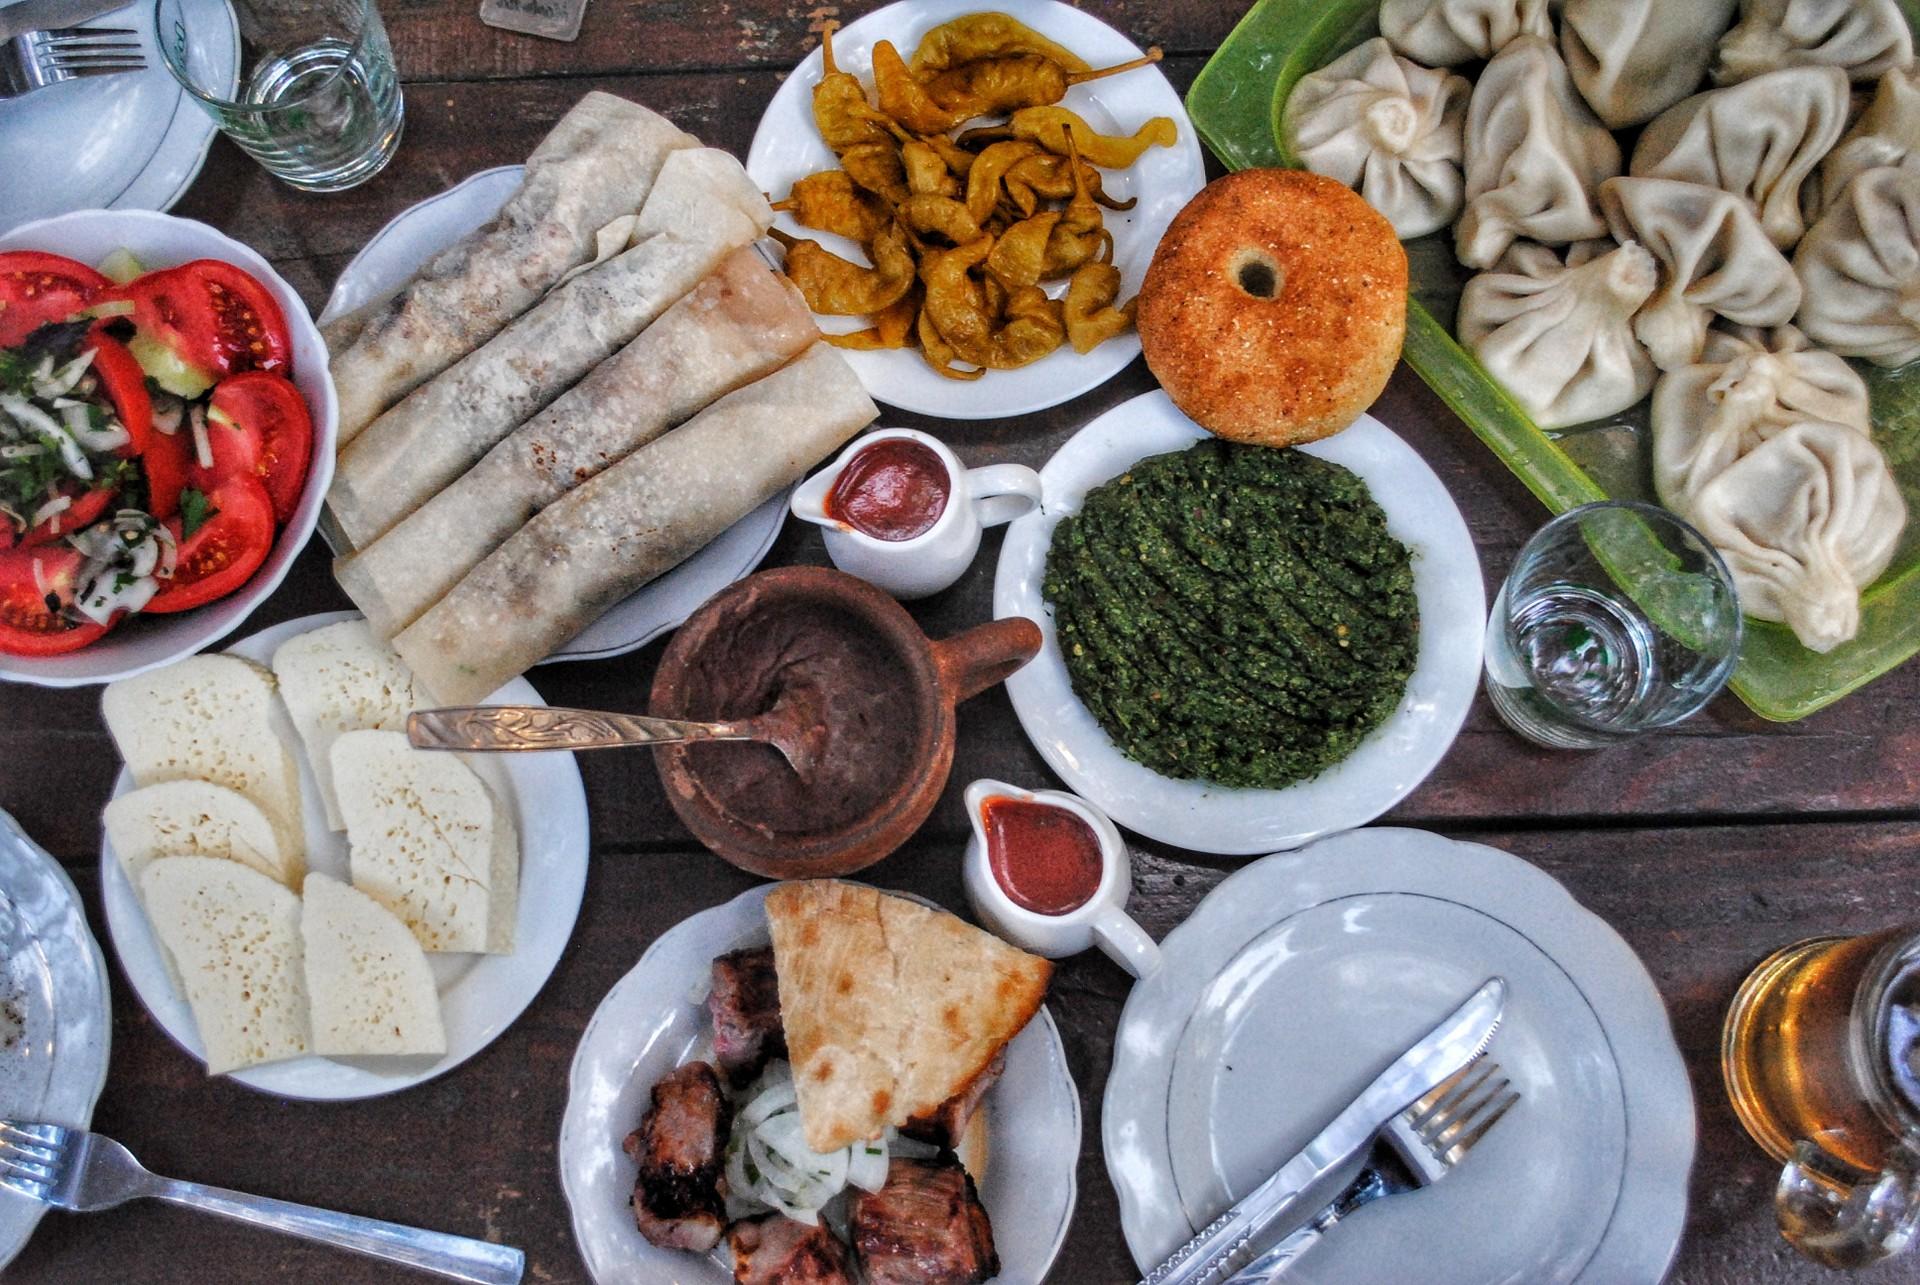 Georgia food tour - dinner spread